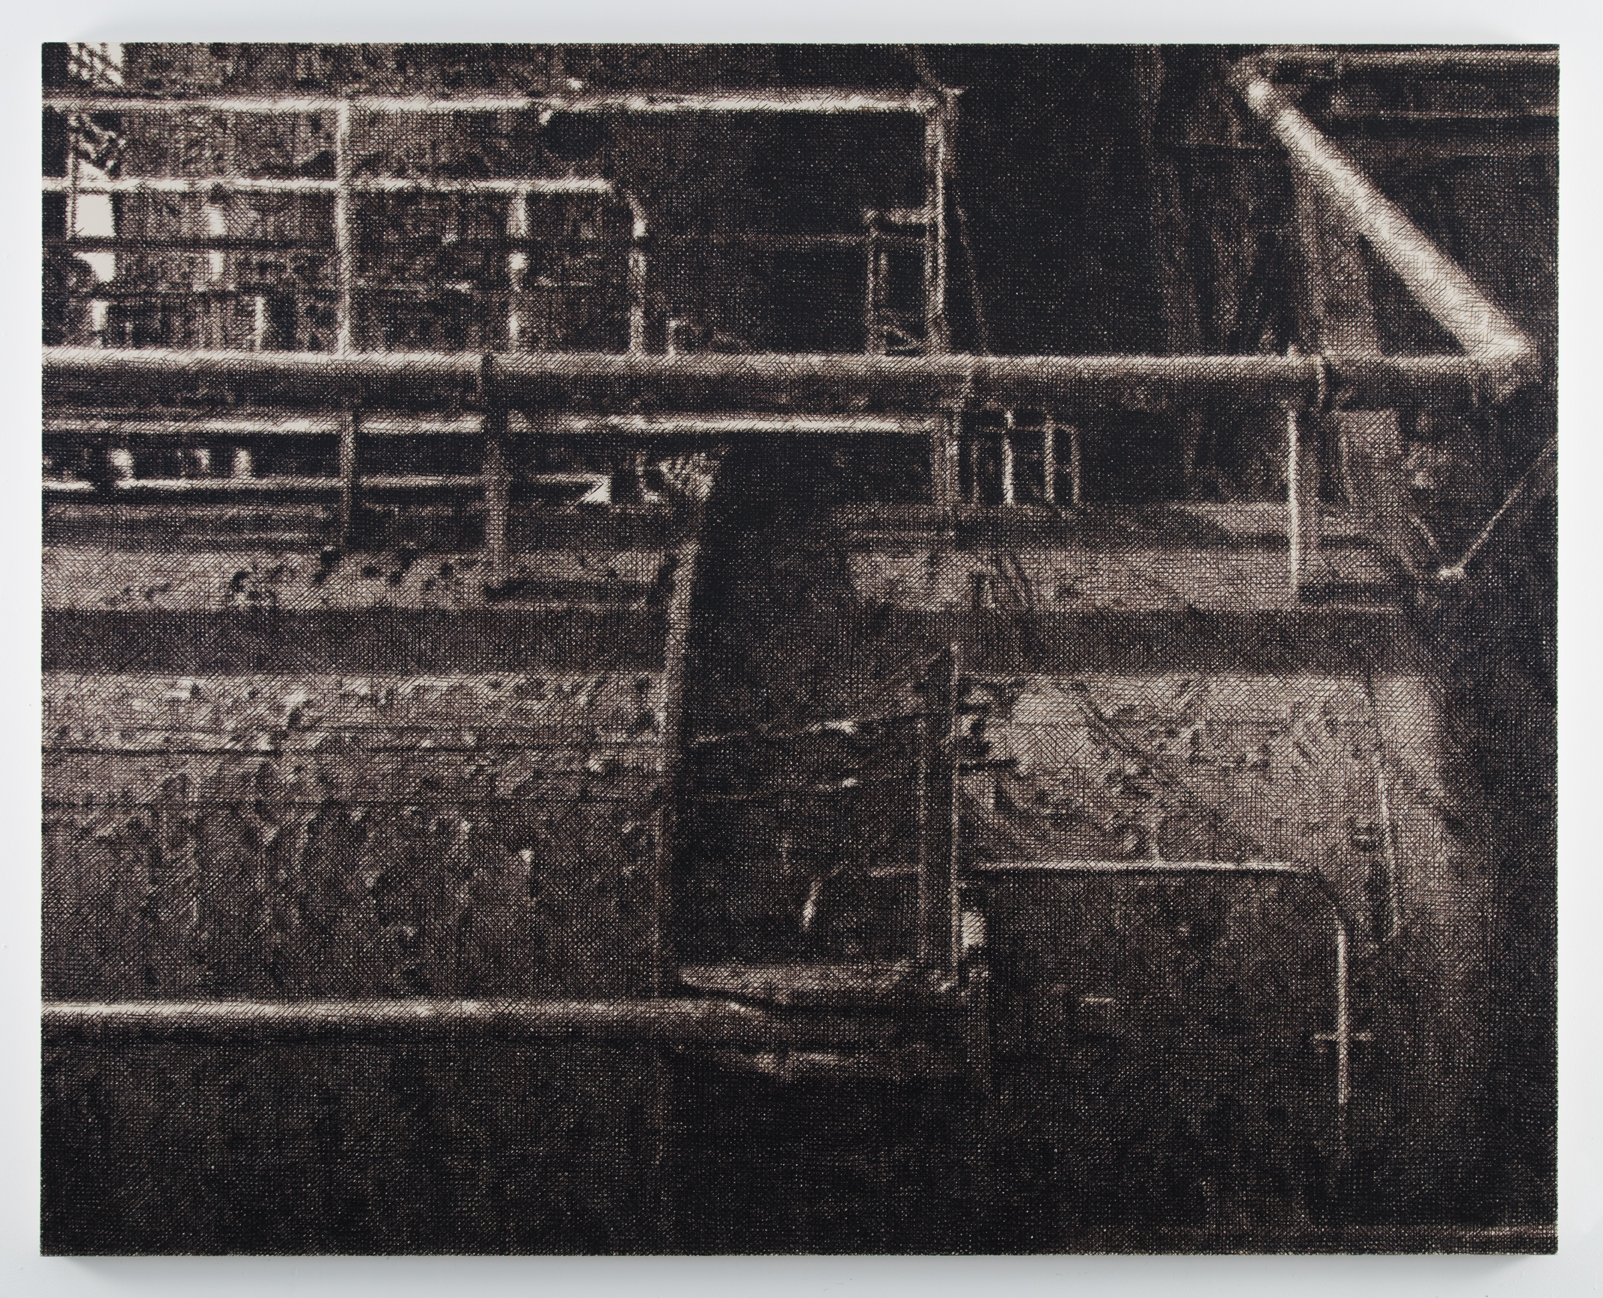 Wayne Gonzales,'Tank' 2016 - 2017,Acrylic on canvas,213.4 x 266.7cm,(84 x 105in) Copyright: Wayne Gonzales Courtesy: Wayne Gonzales and Stephen Friedman Gallery, London